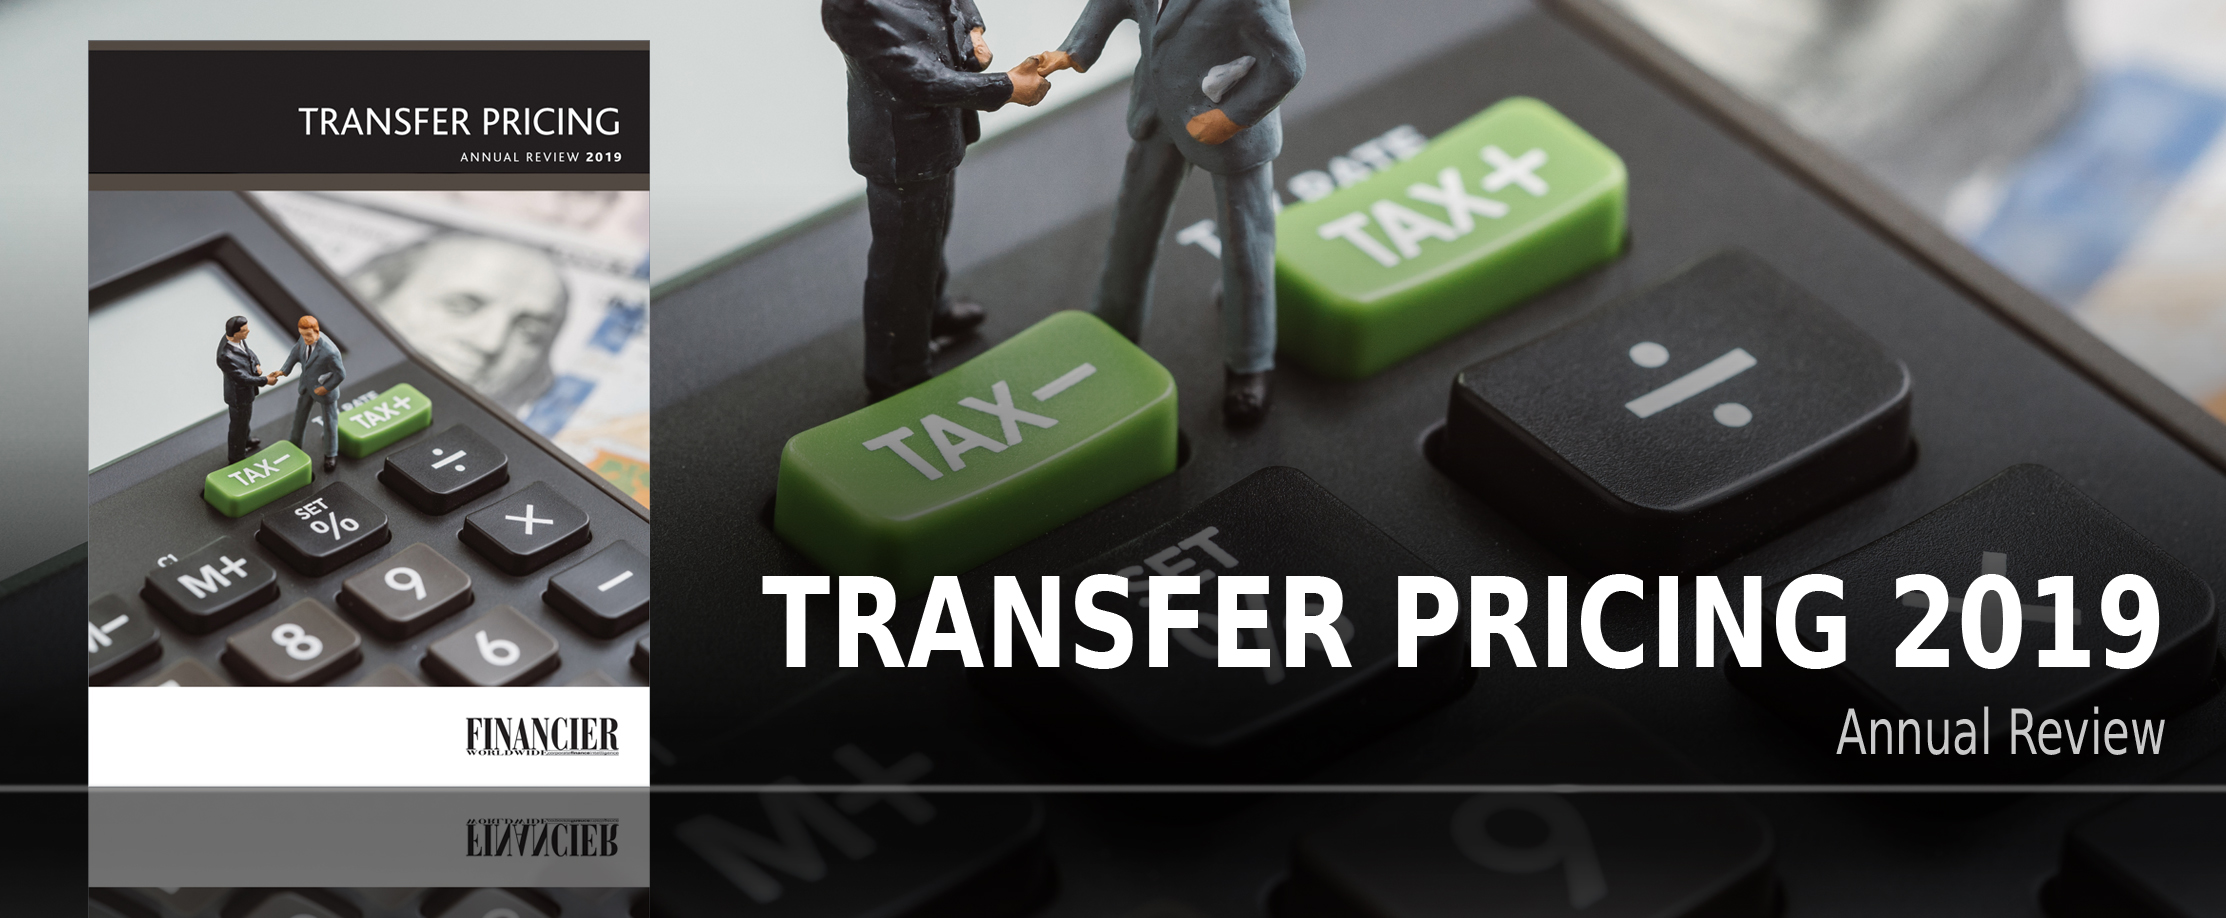 ARTitle_TransferPricing.jpg